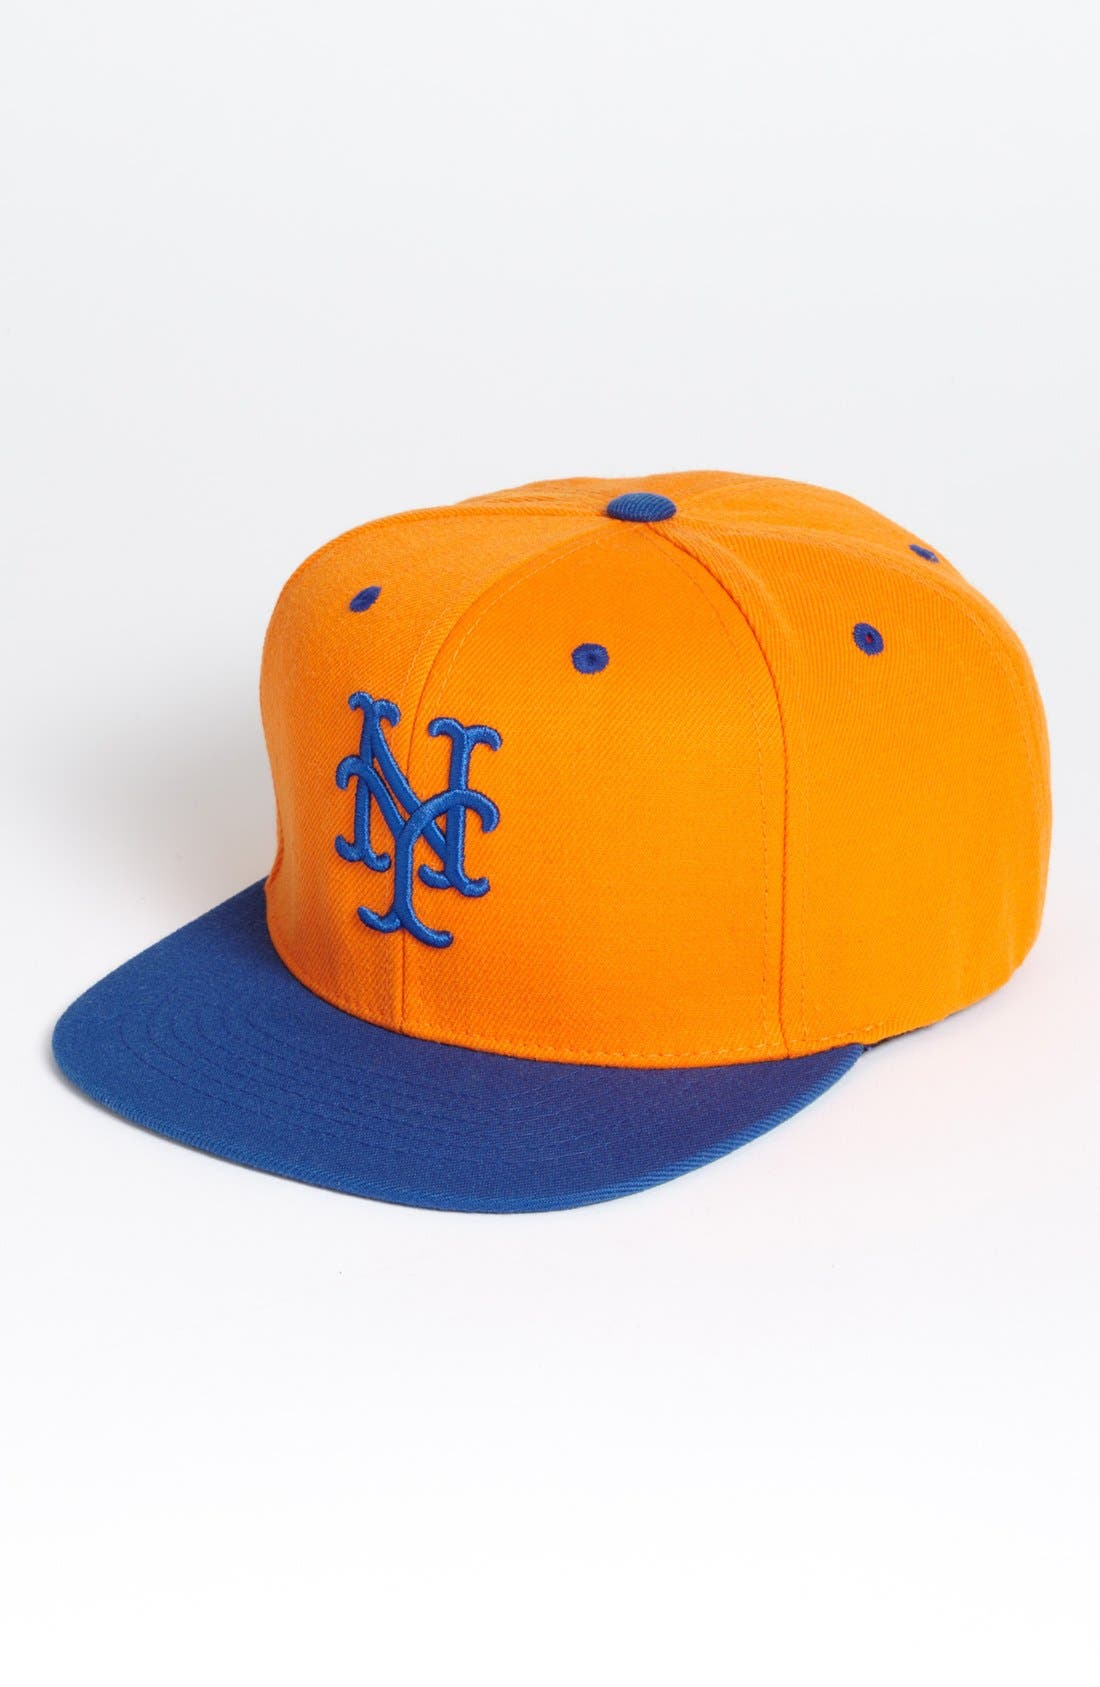 Alternate Image 1 Selected - American Needle 'New York Mets - Back 2 Front' Snapback Baseball Cap